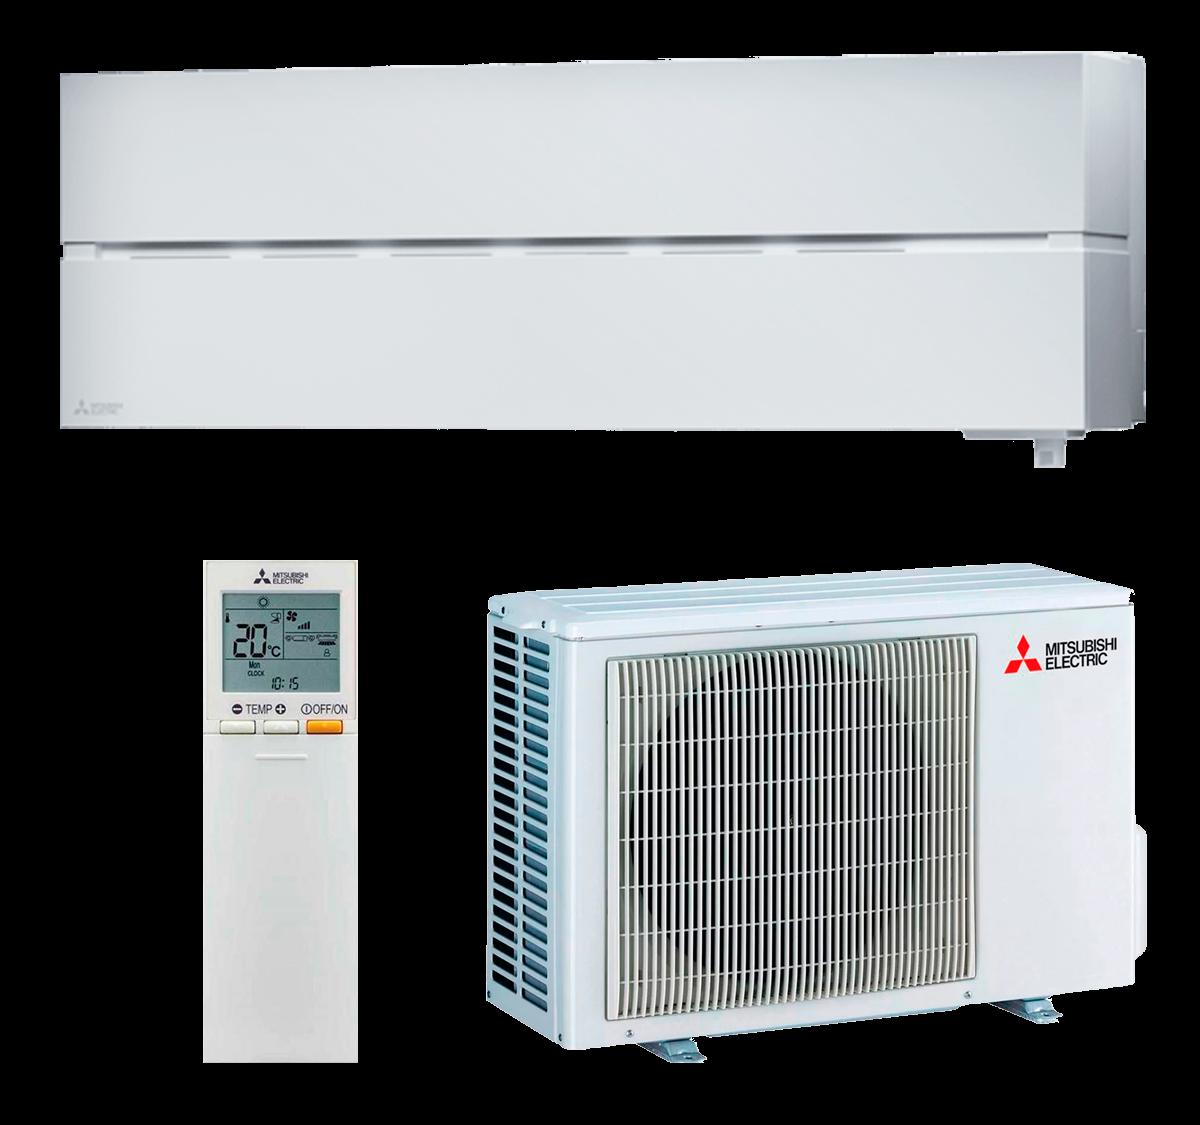 aire acondicionado split blanco mitsubishi electric inverter serie kirigamine style modelo msz ln25vgw precio incluido instalacion caseragua 03